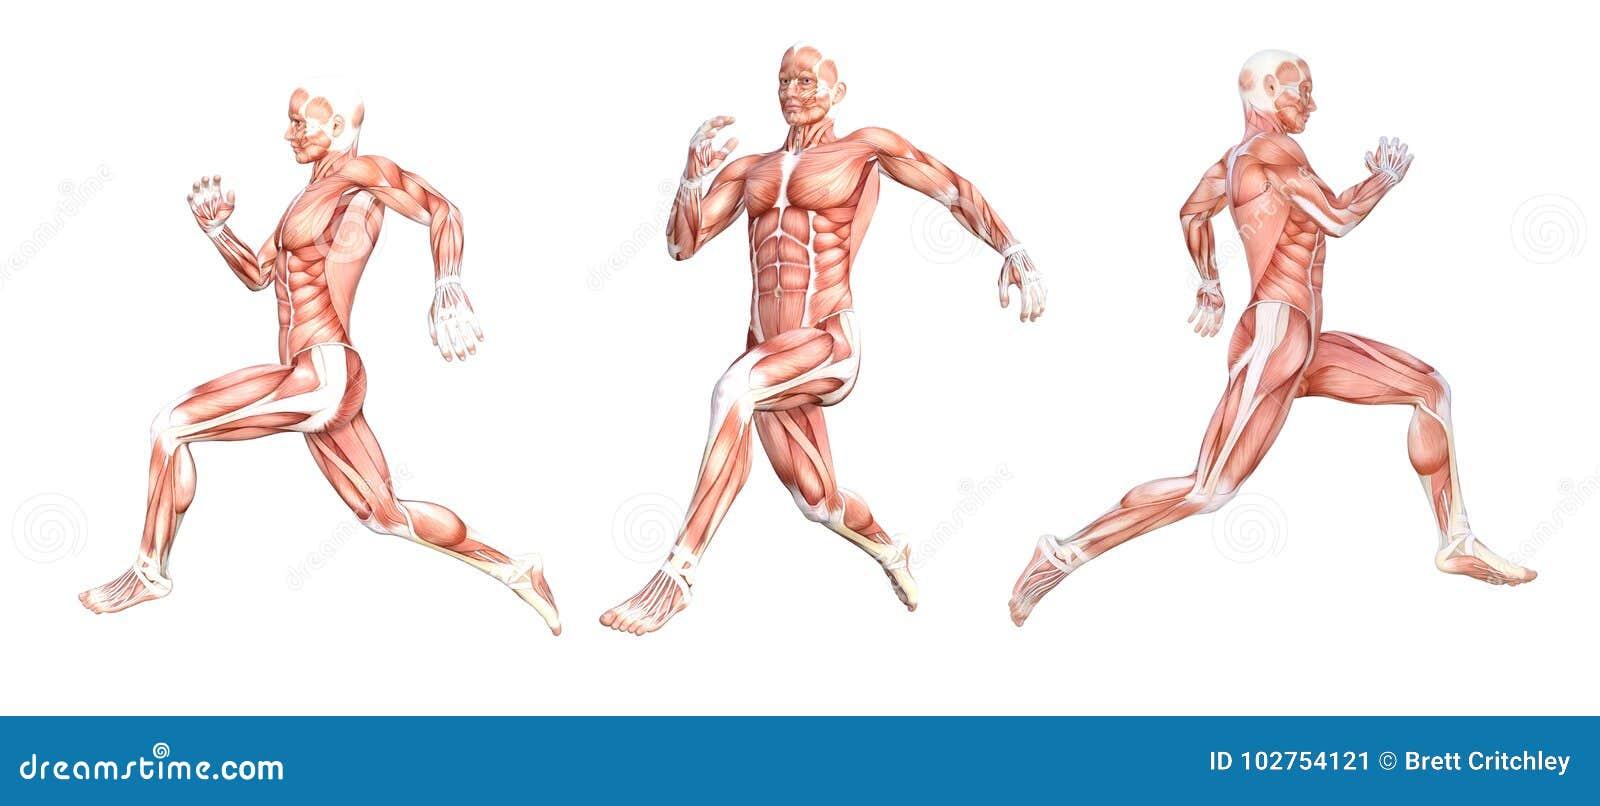 Anatomical Man Running Muscles Stock Illustration - Illustration of ...